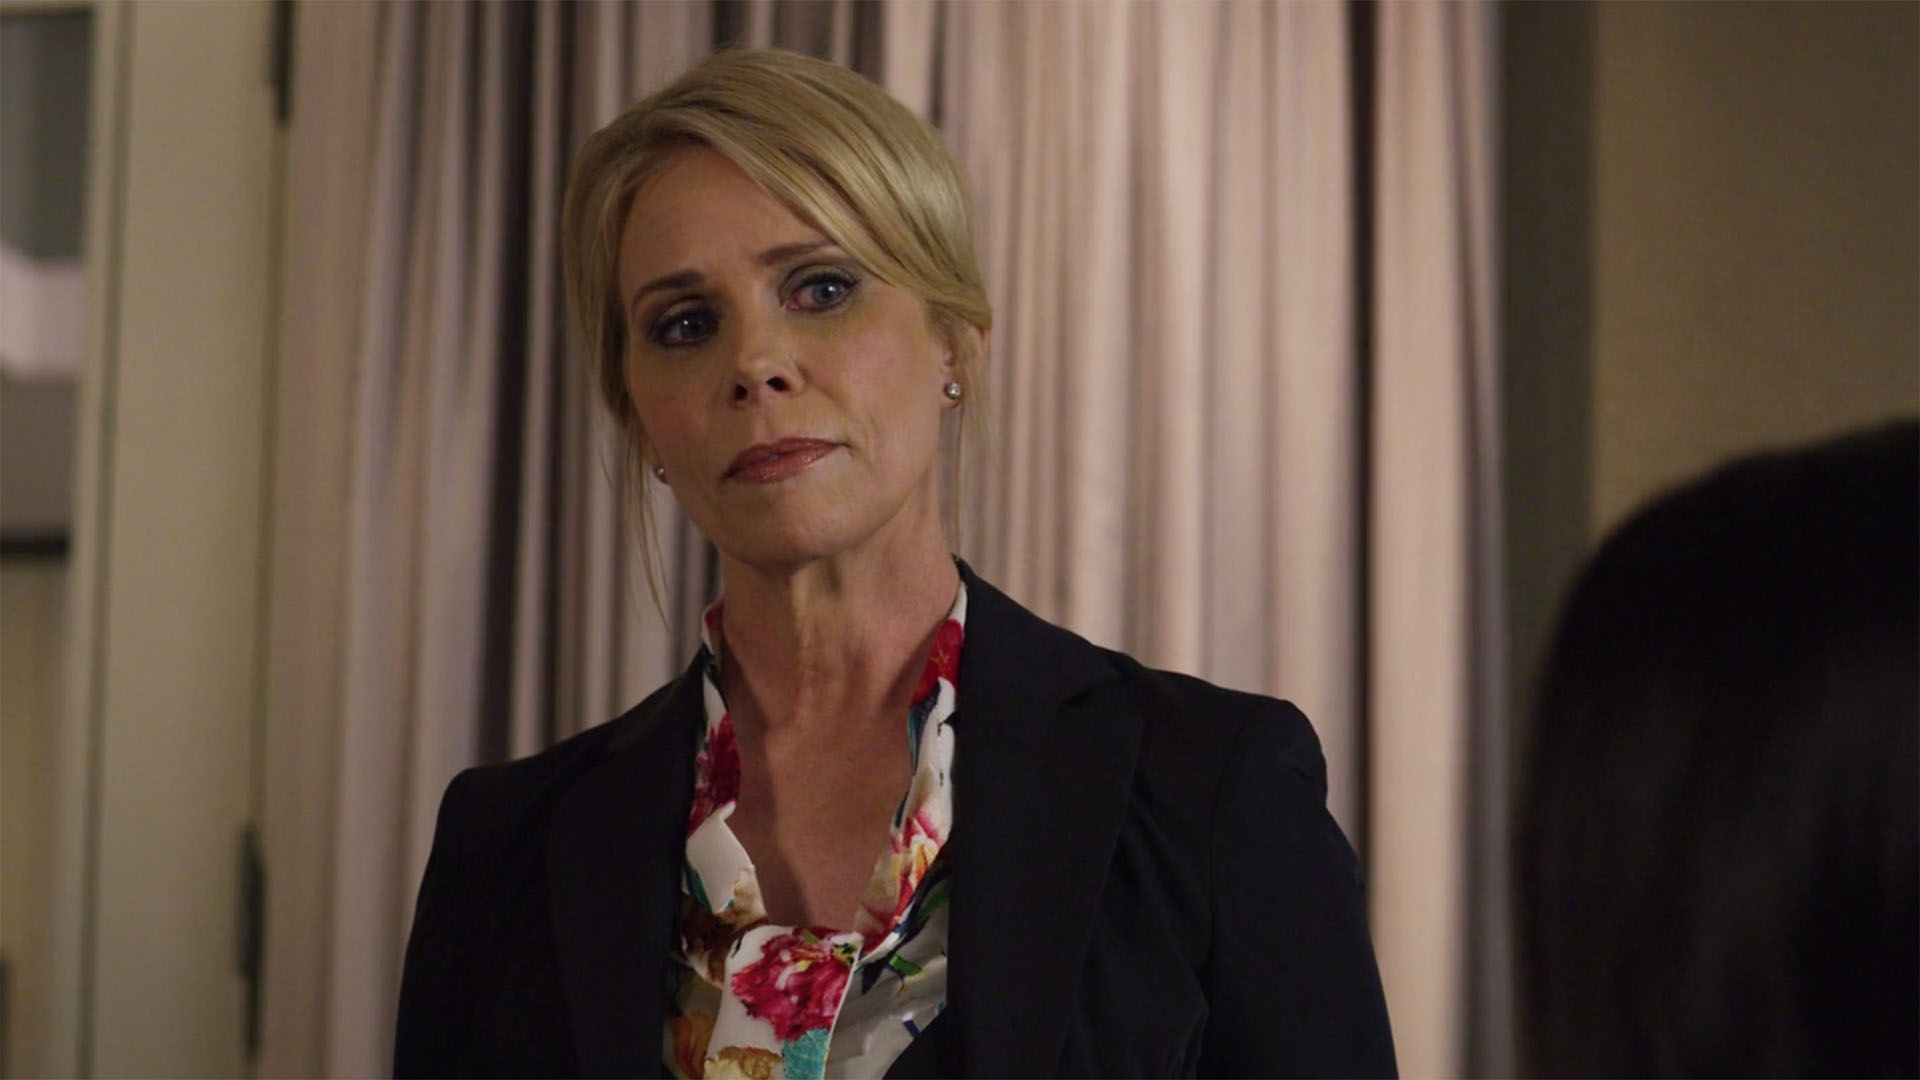 Cheryl Hines as Brenda Decarlo